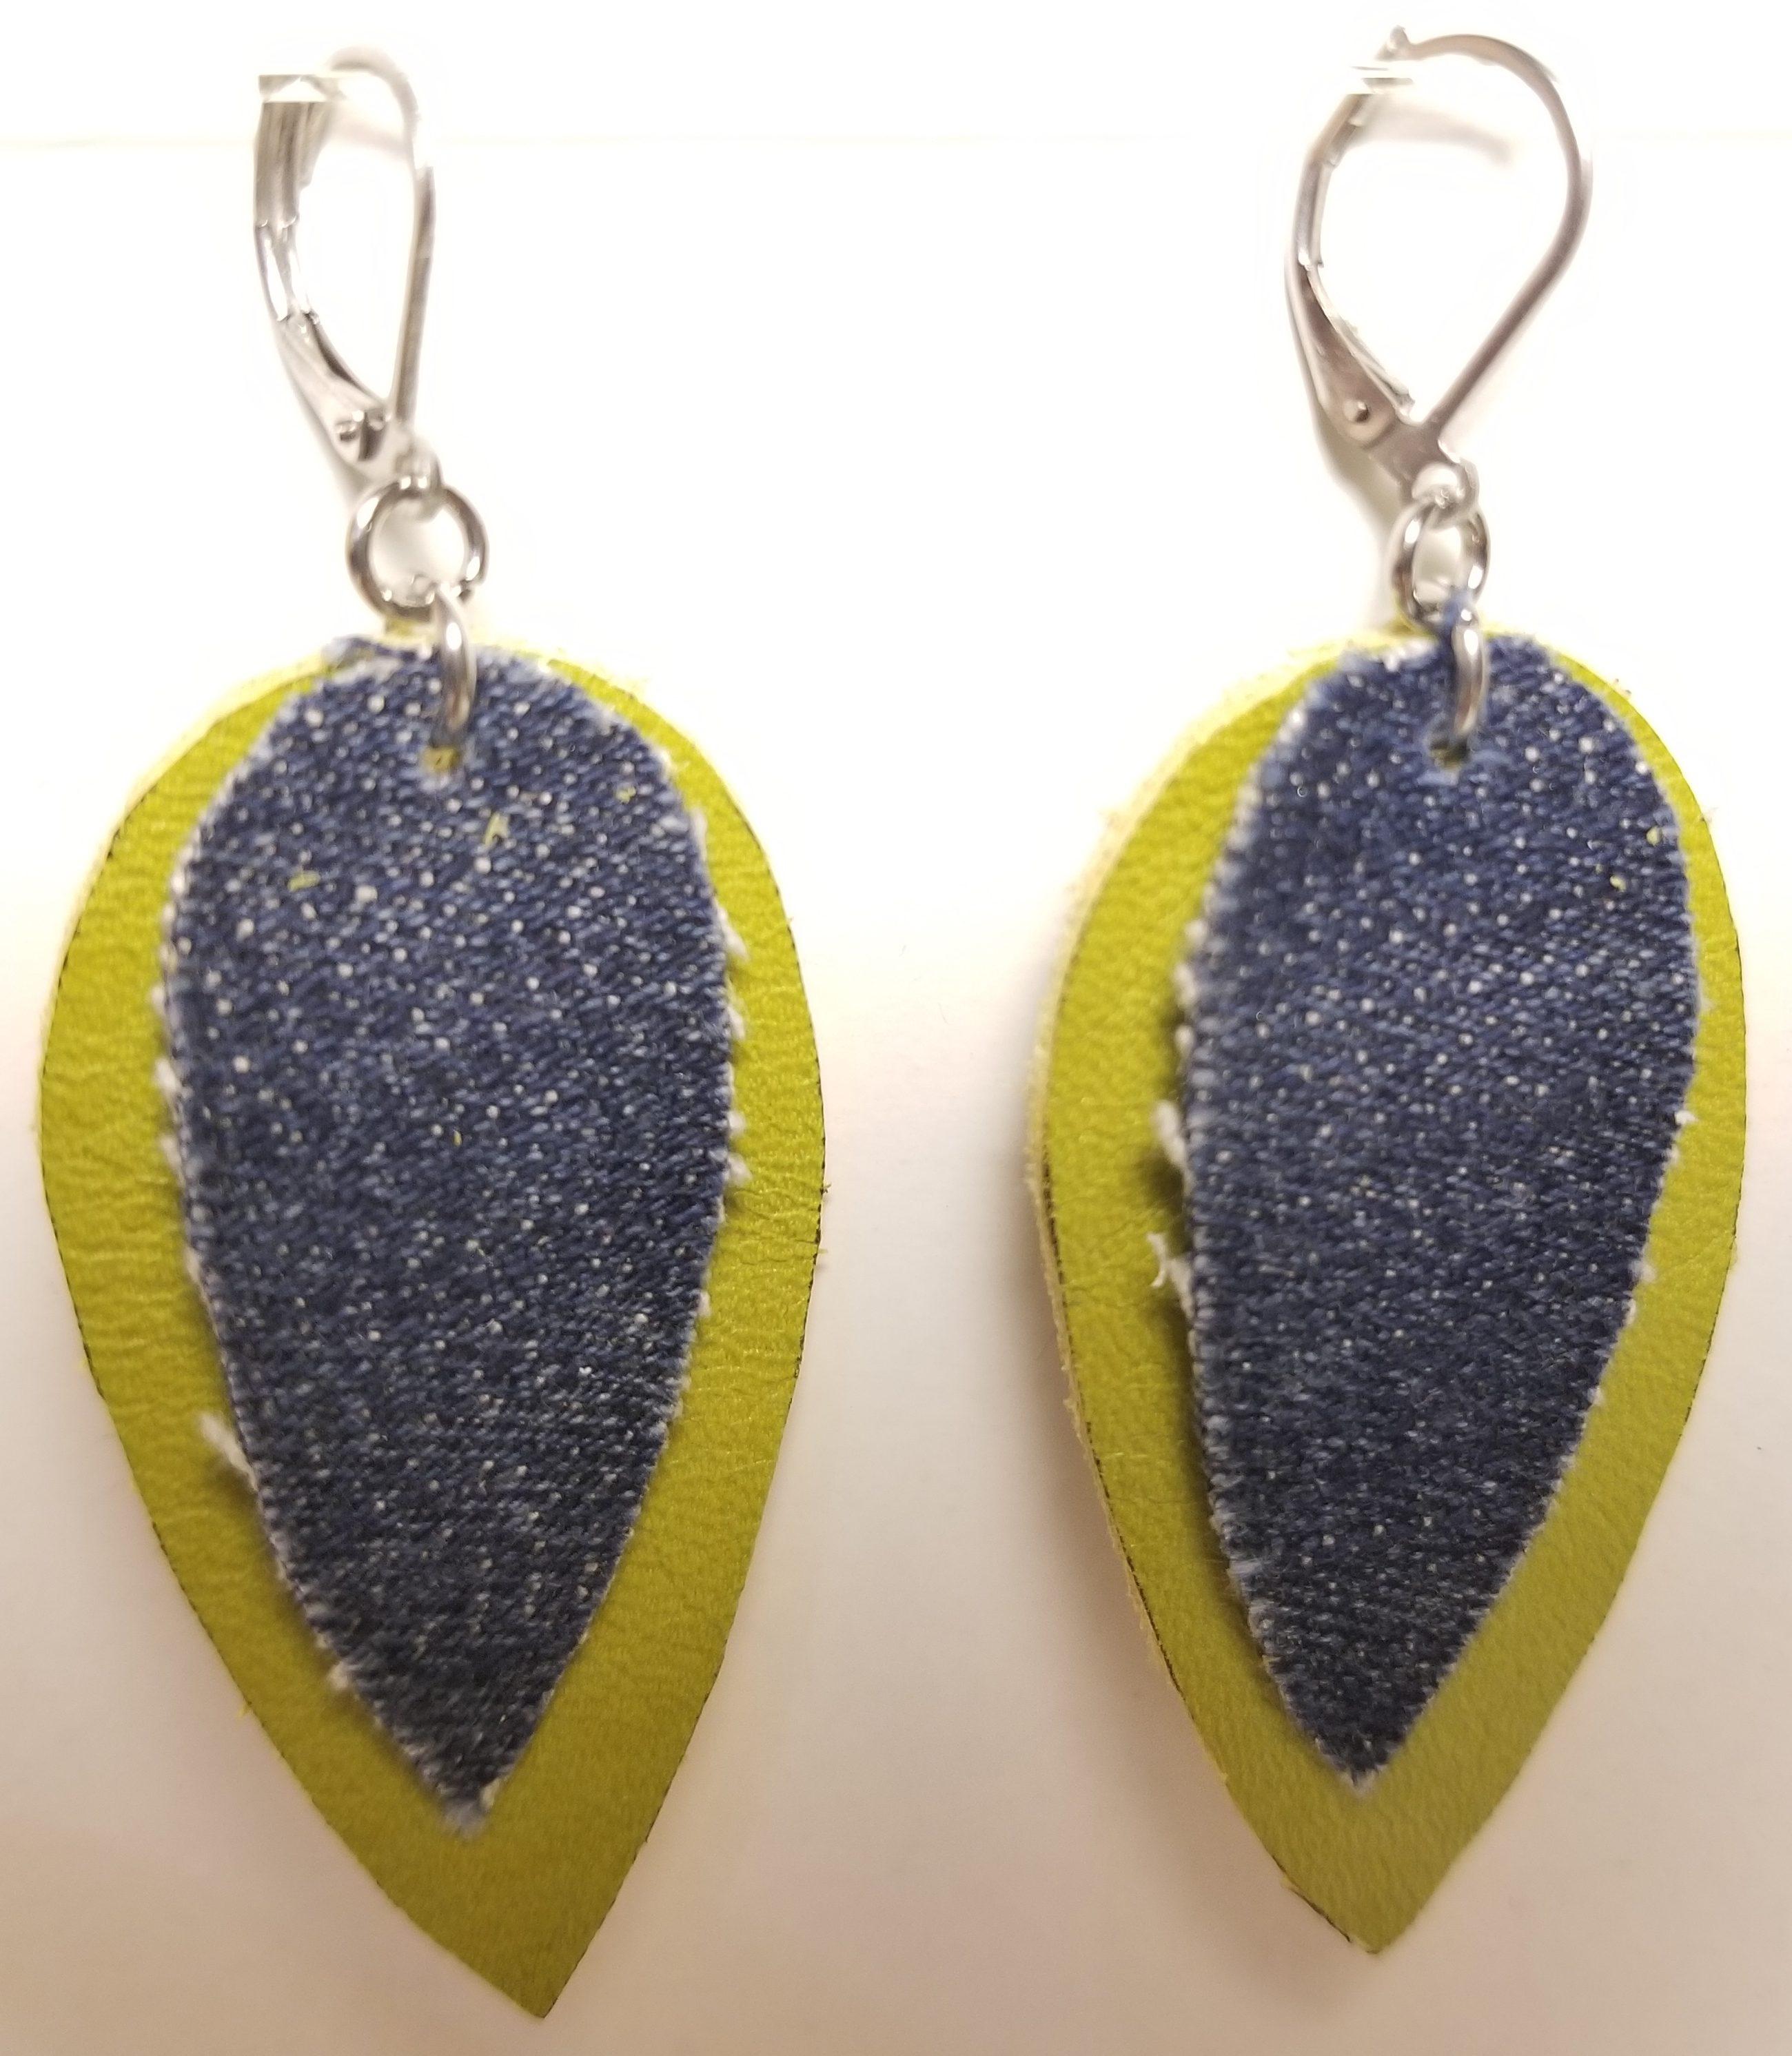 be513c5c8 Sili+Bells Lenim Drops Earrings